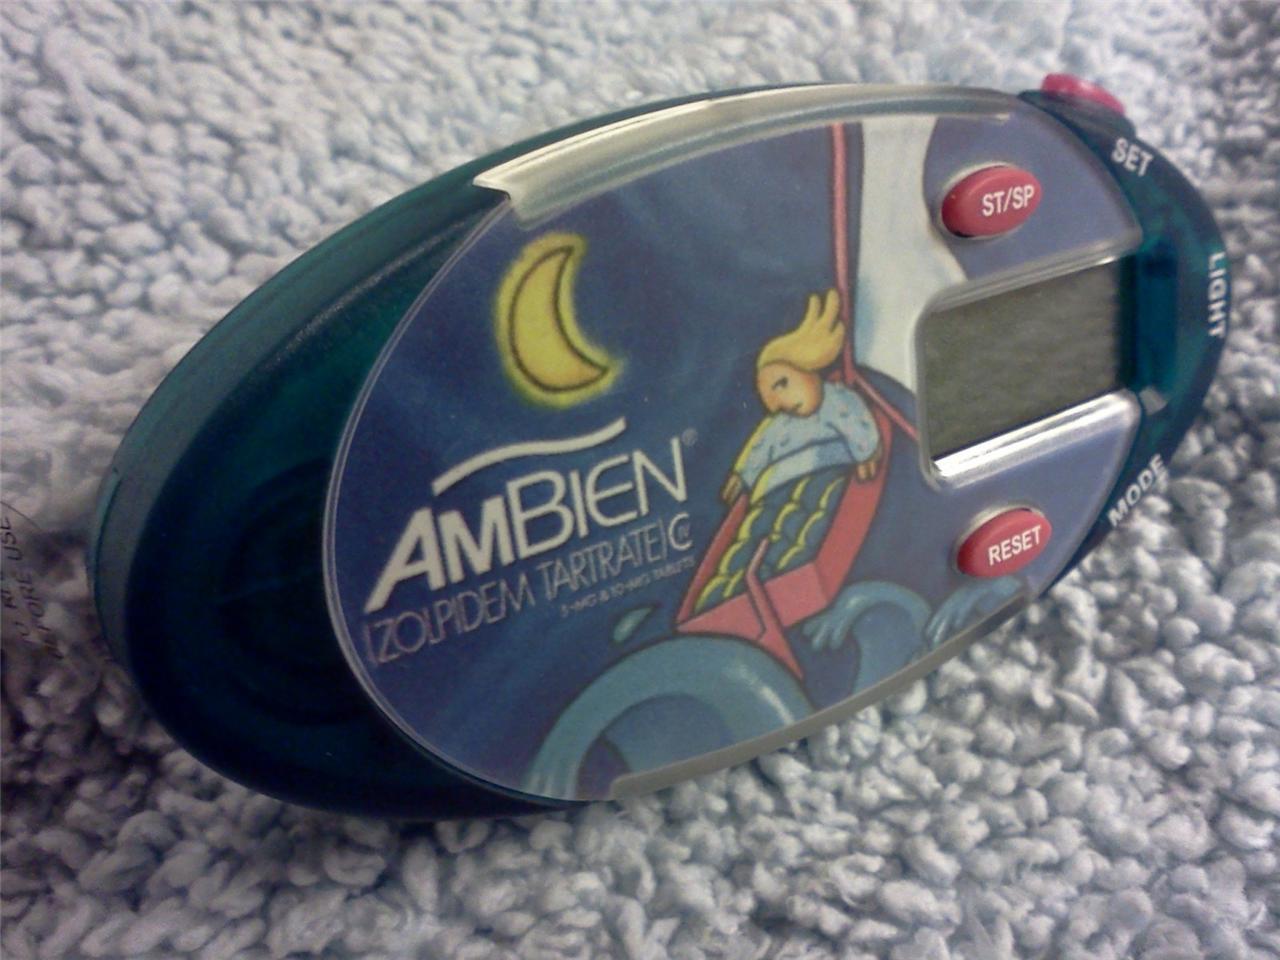 Ambien Drug Rep Nurse Stethoscope Clip-on Pulse Timer Stop Watch Chrono Alarm 1